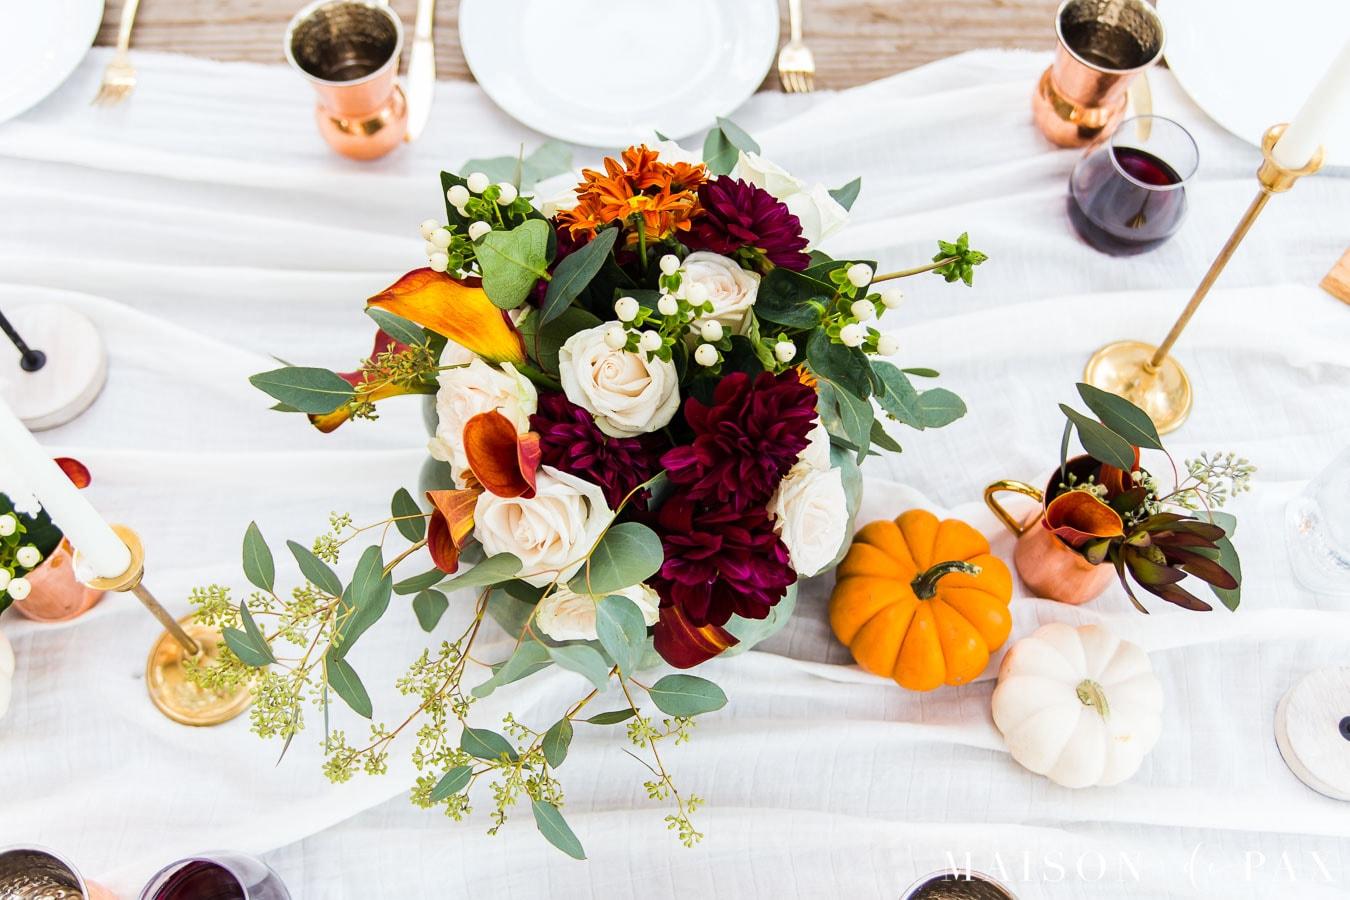 fall floral centerpiece and mini pumpkins on thanksgiving table | Maison de Pax